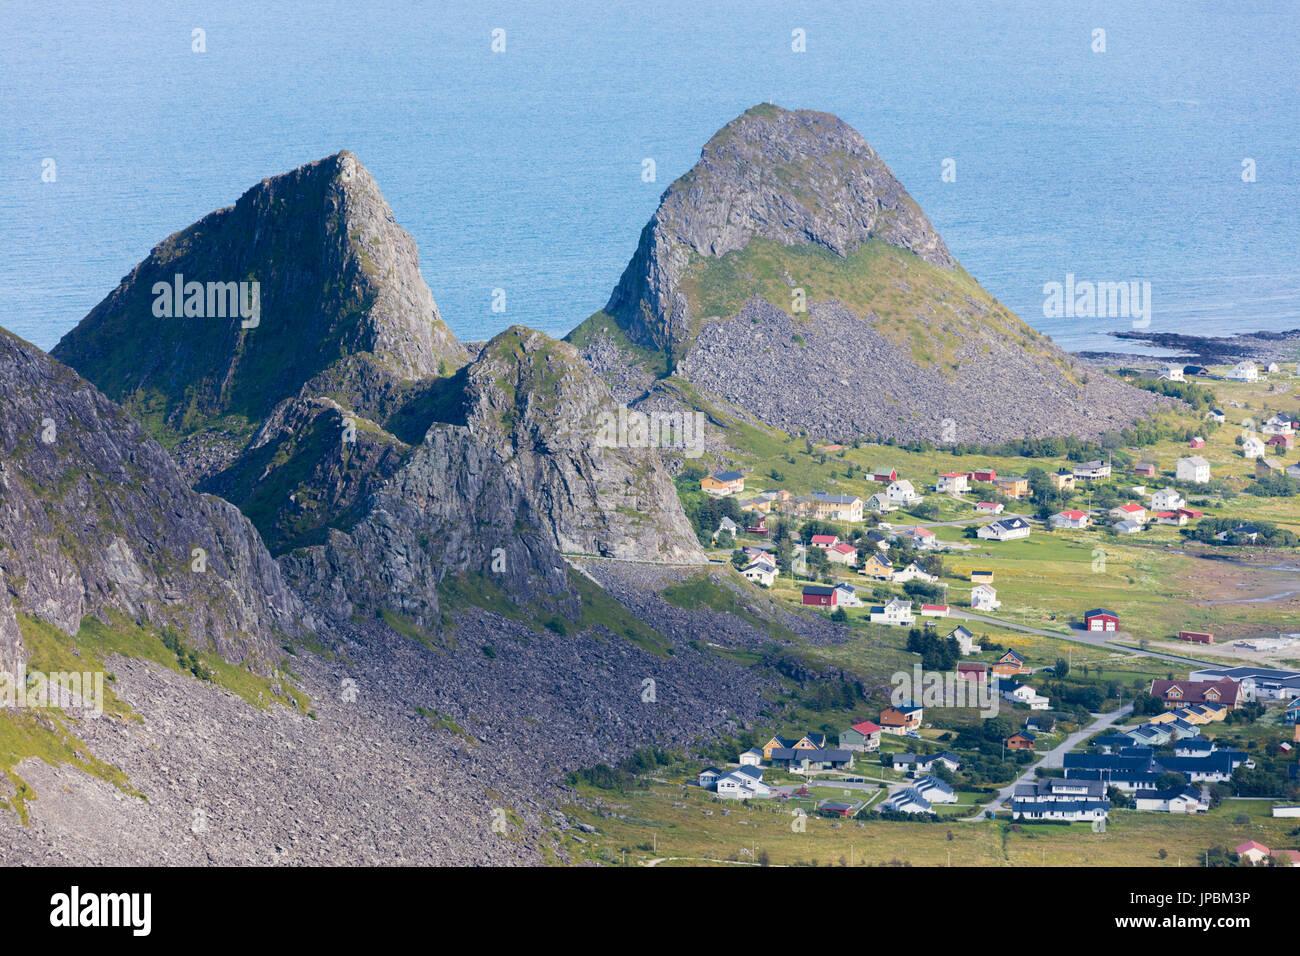 Rocky peaks frame the village of Sorland surrounded by sea Vaeroy Island Nordland county Lofoten archipelago Norway Europe - Stock Image